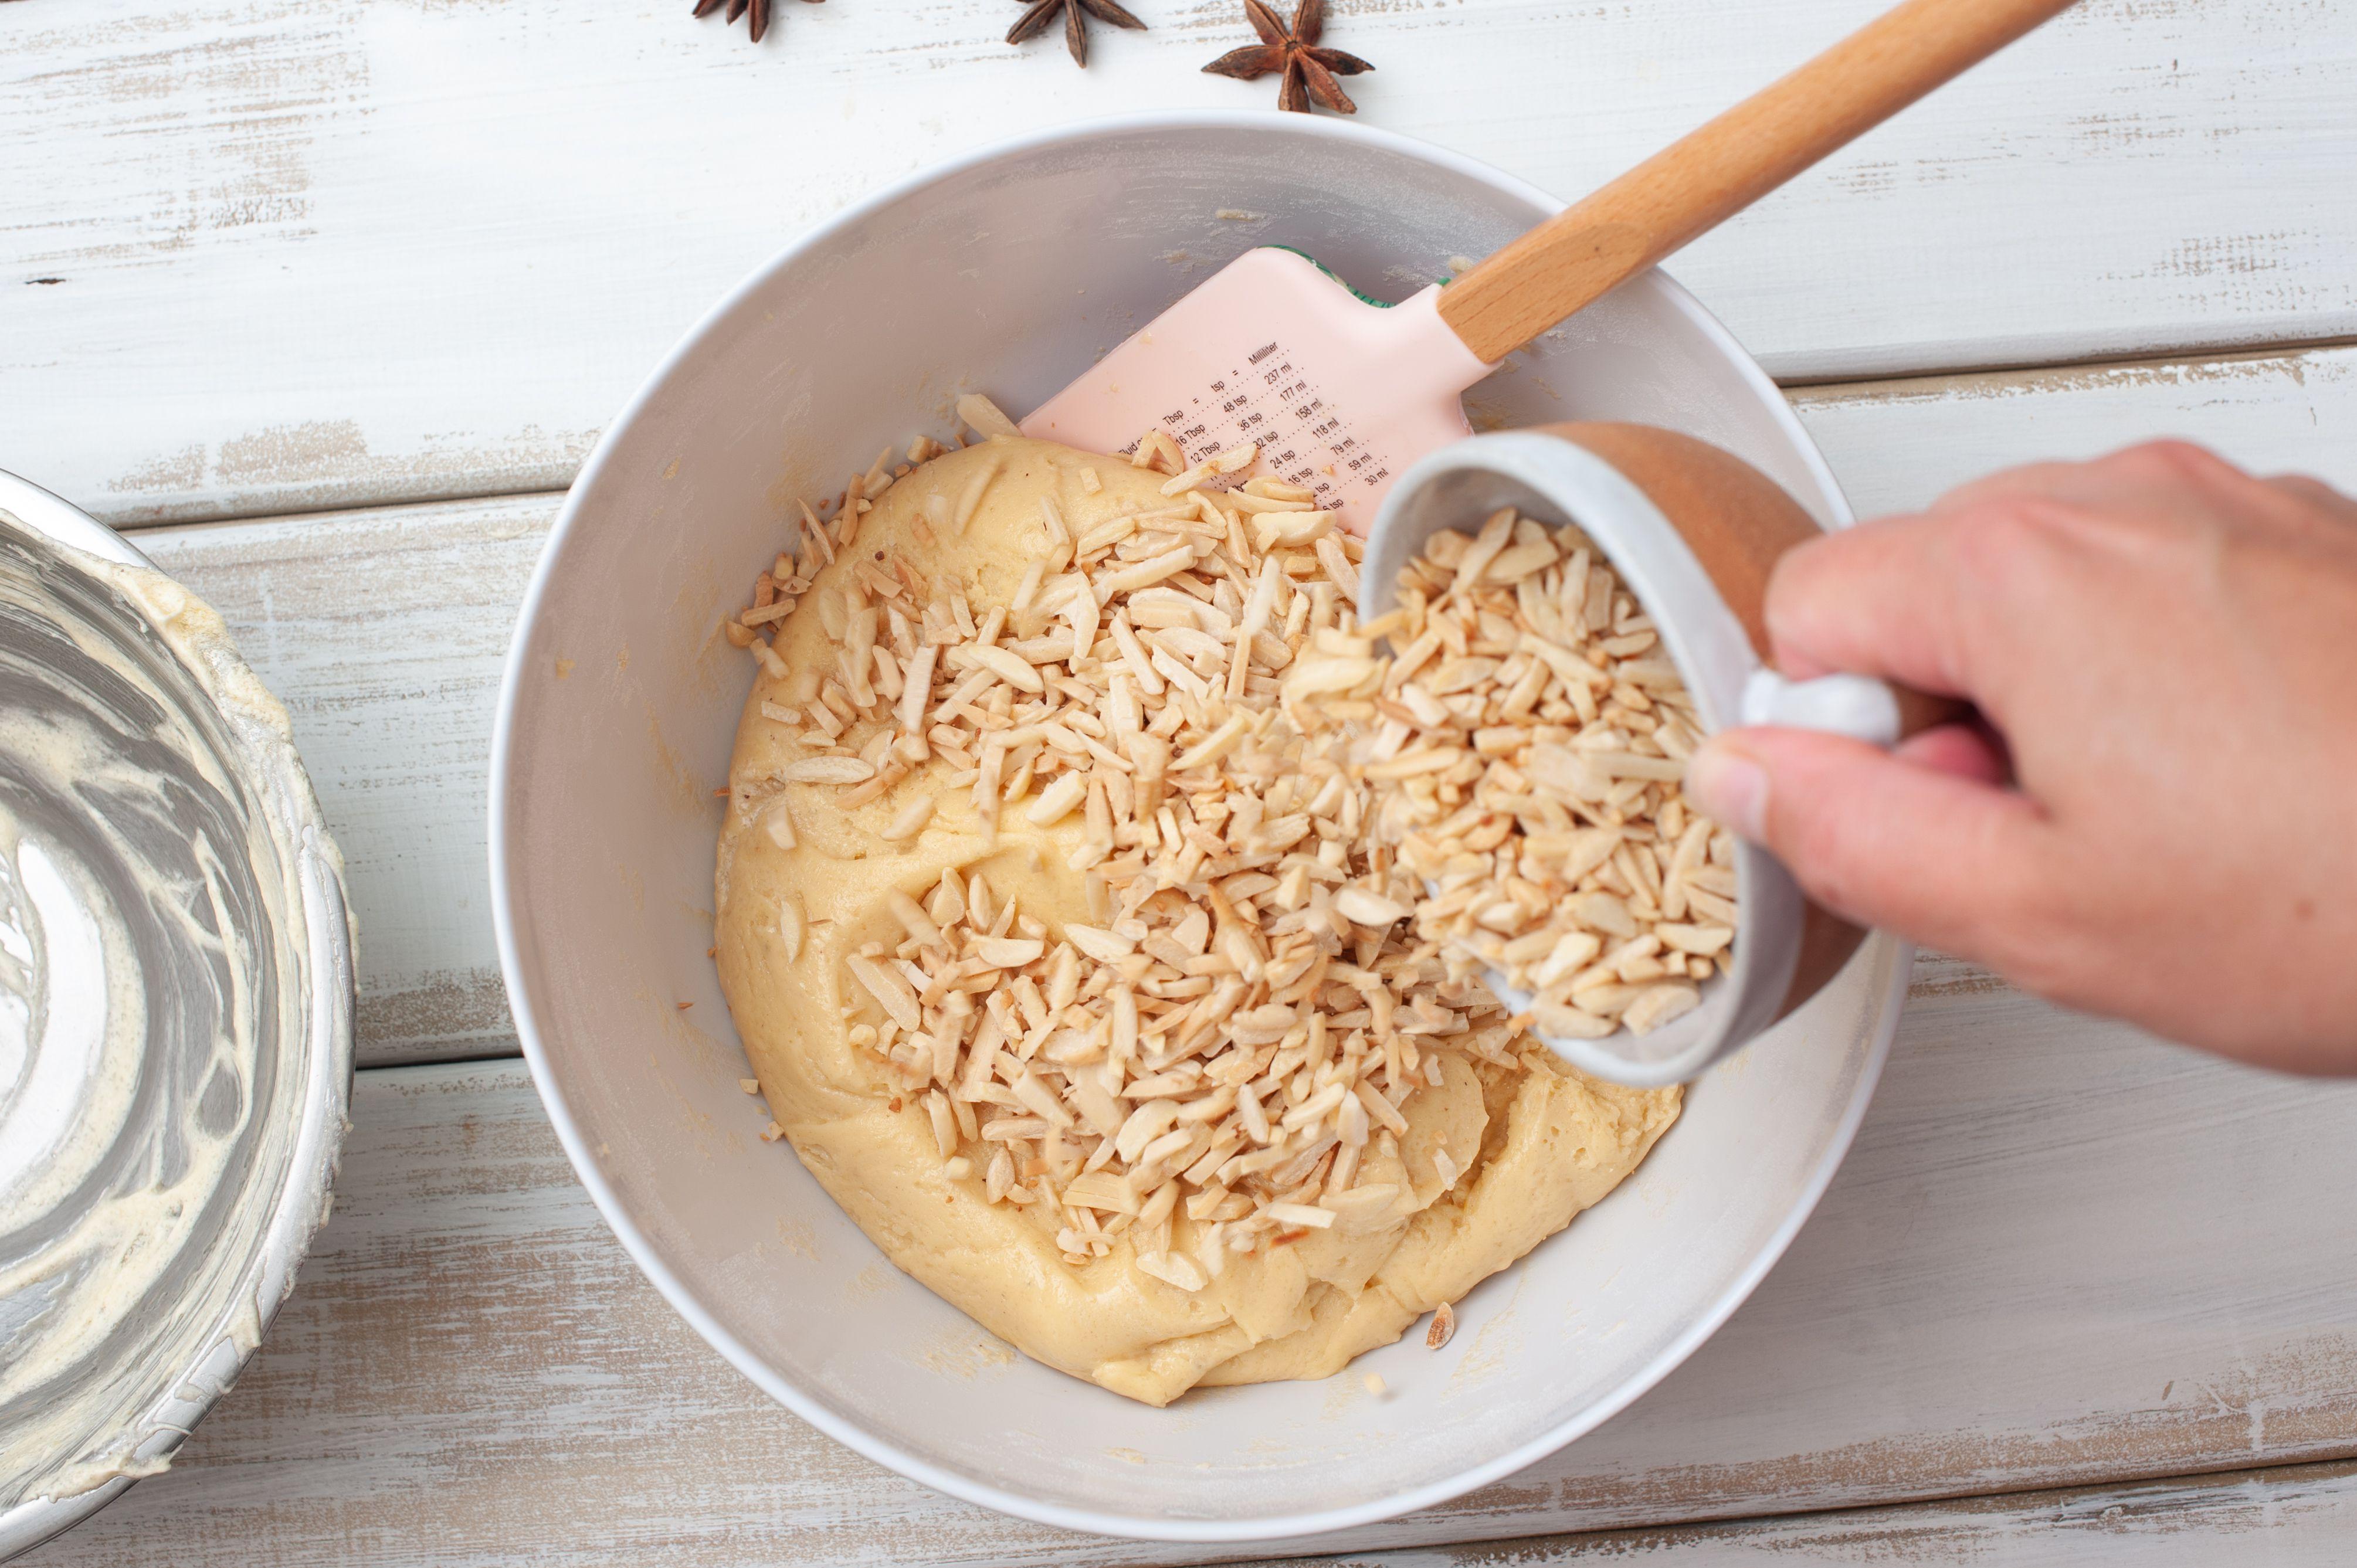 Add almonds